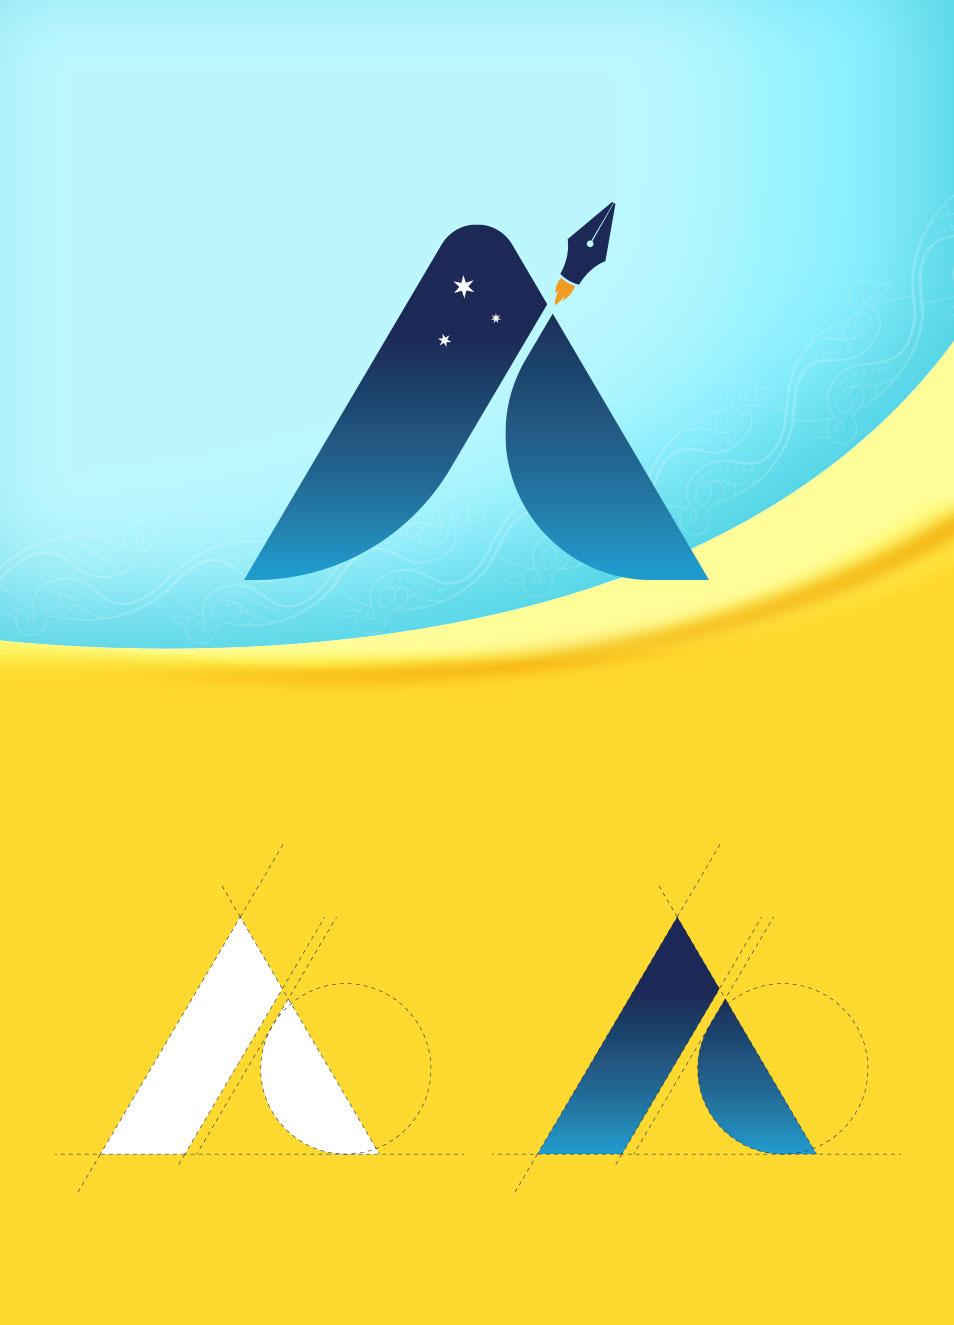 branding - logo design designer logo space logo Pen tool